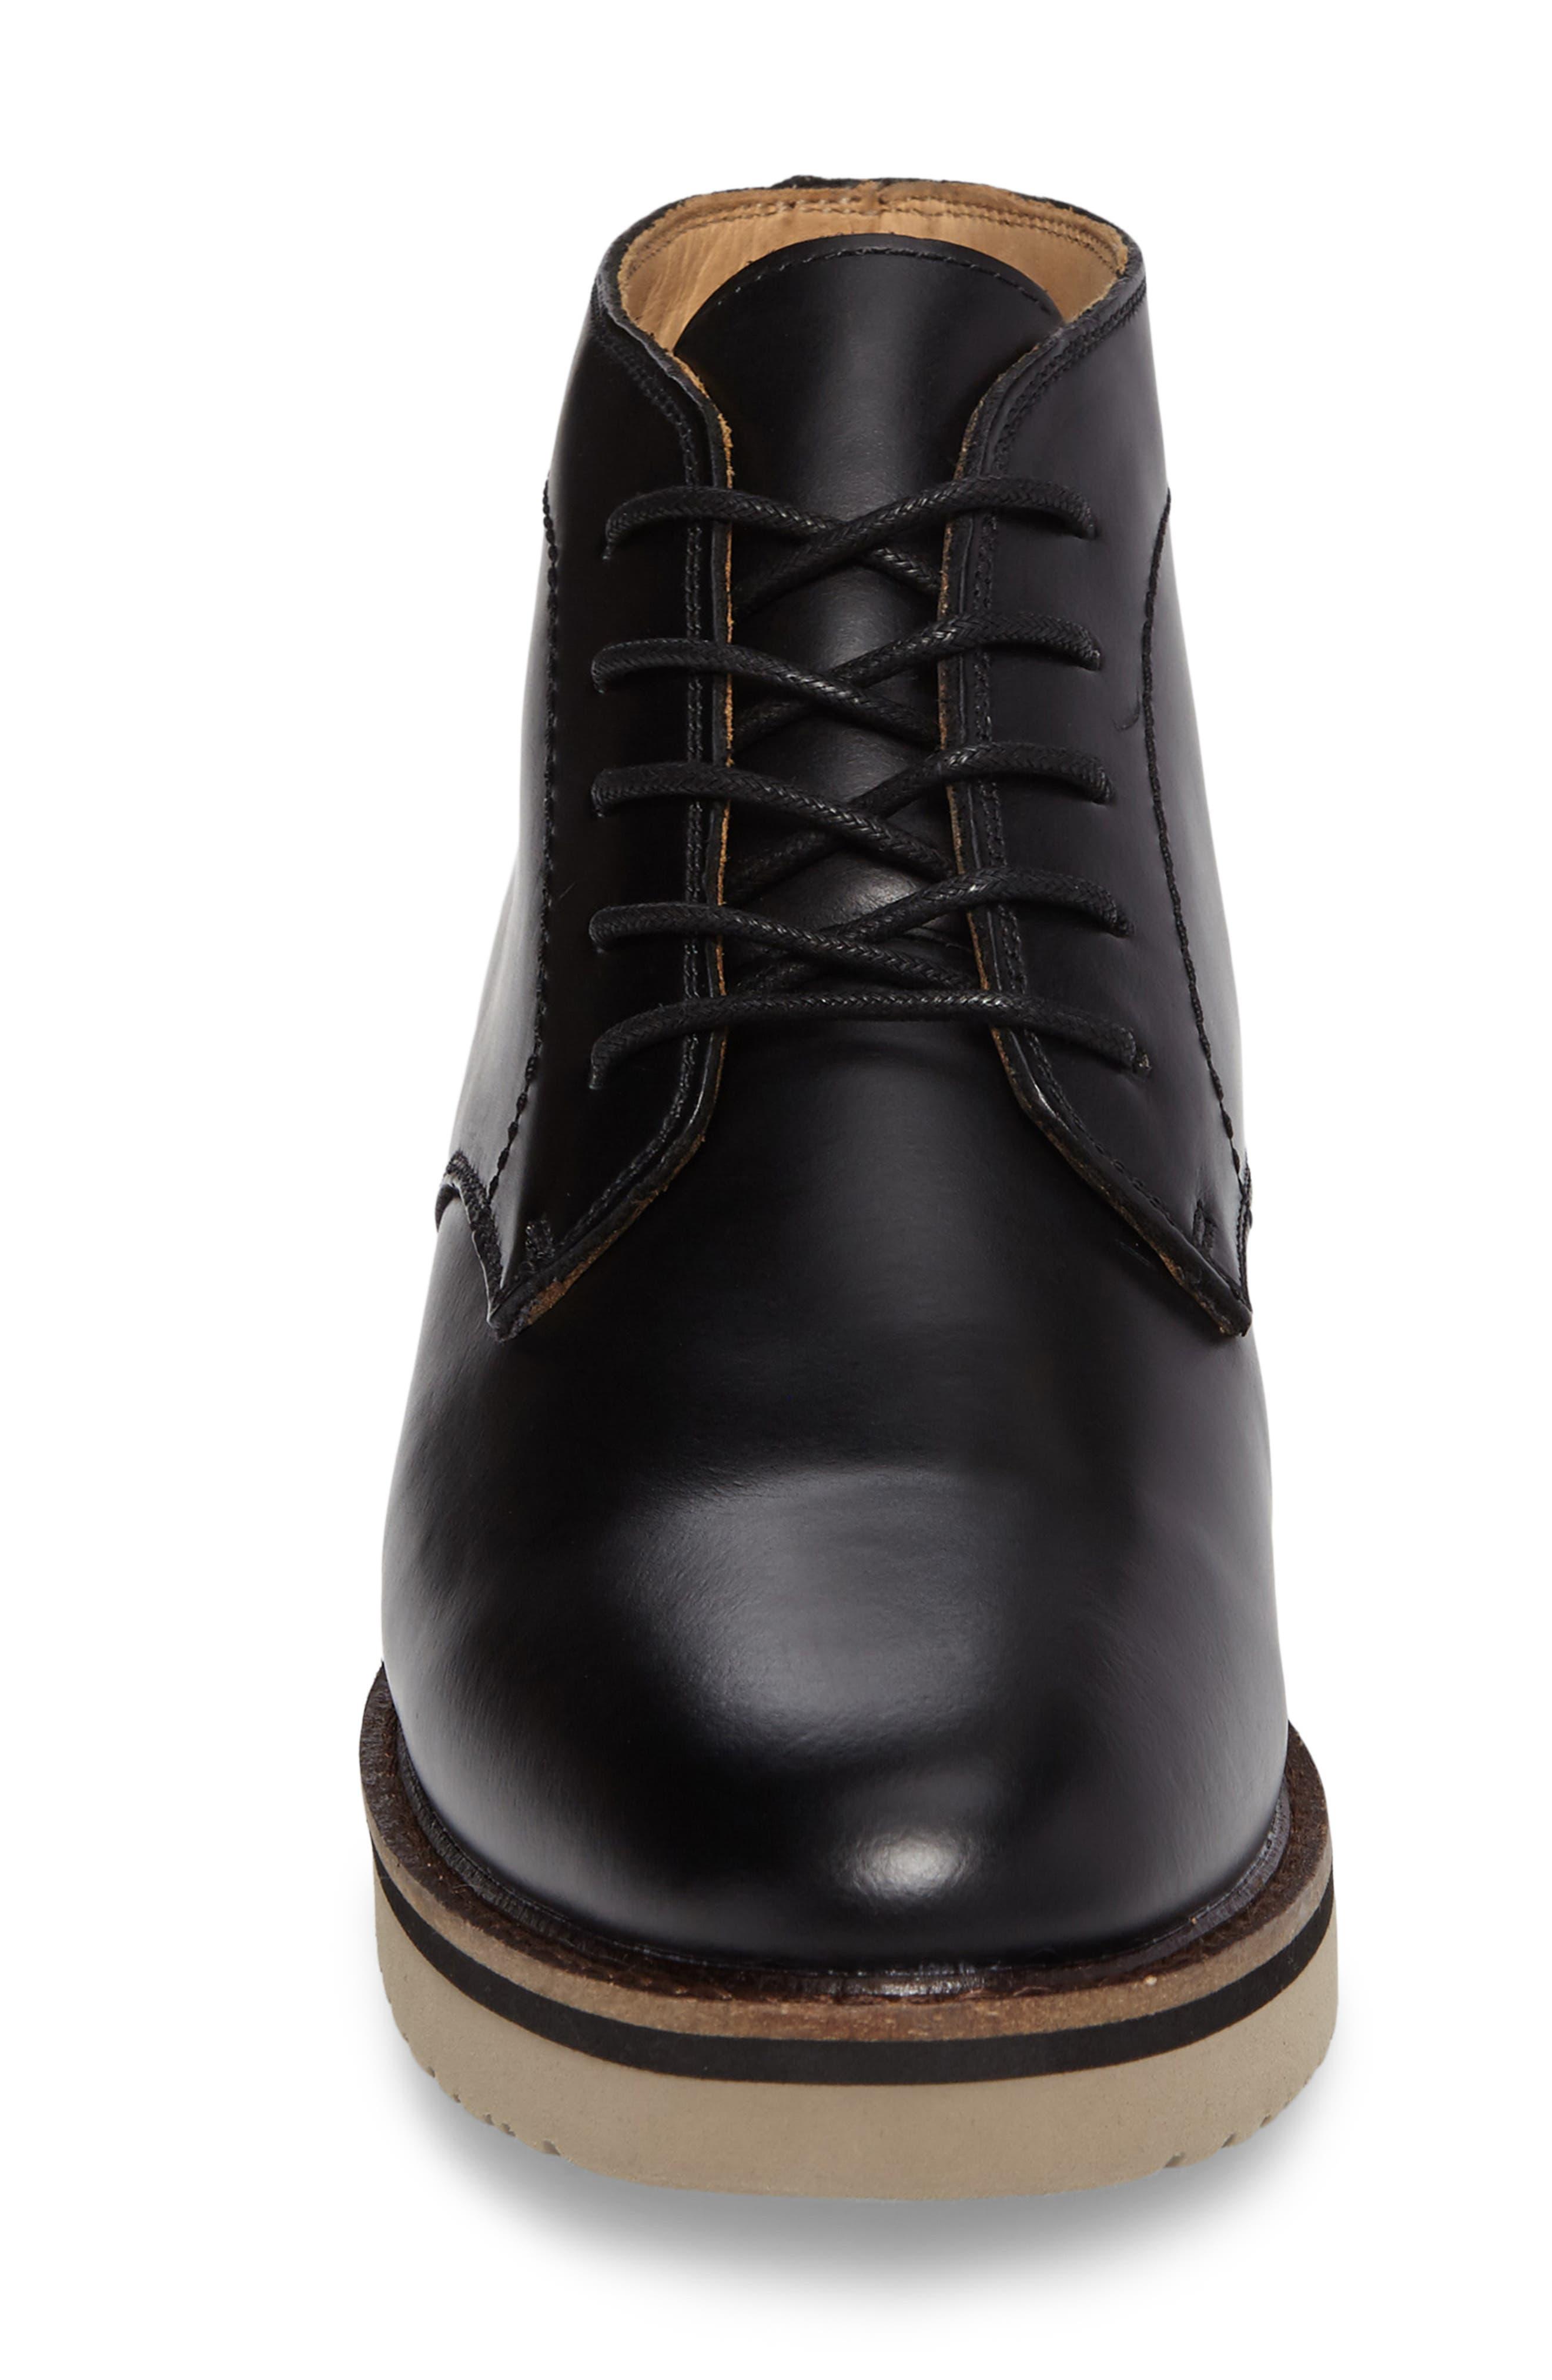 'Farley' Chukka Boot,                             Alternate thumbnail 4, color,                             Black/ Black Leather